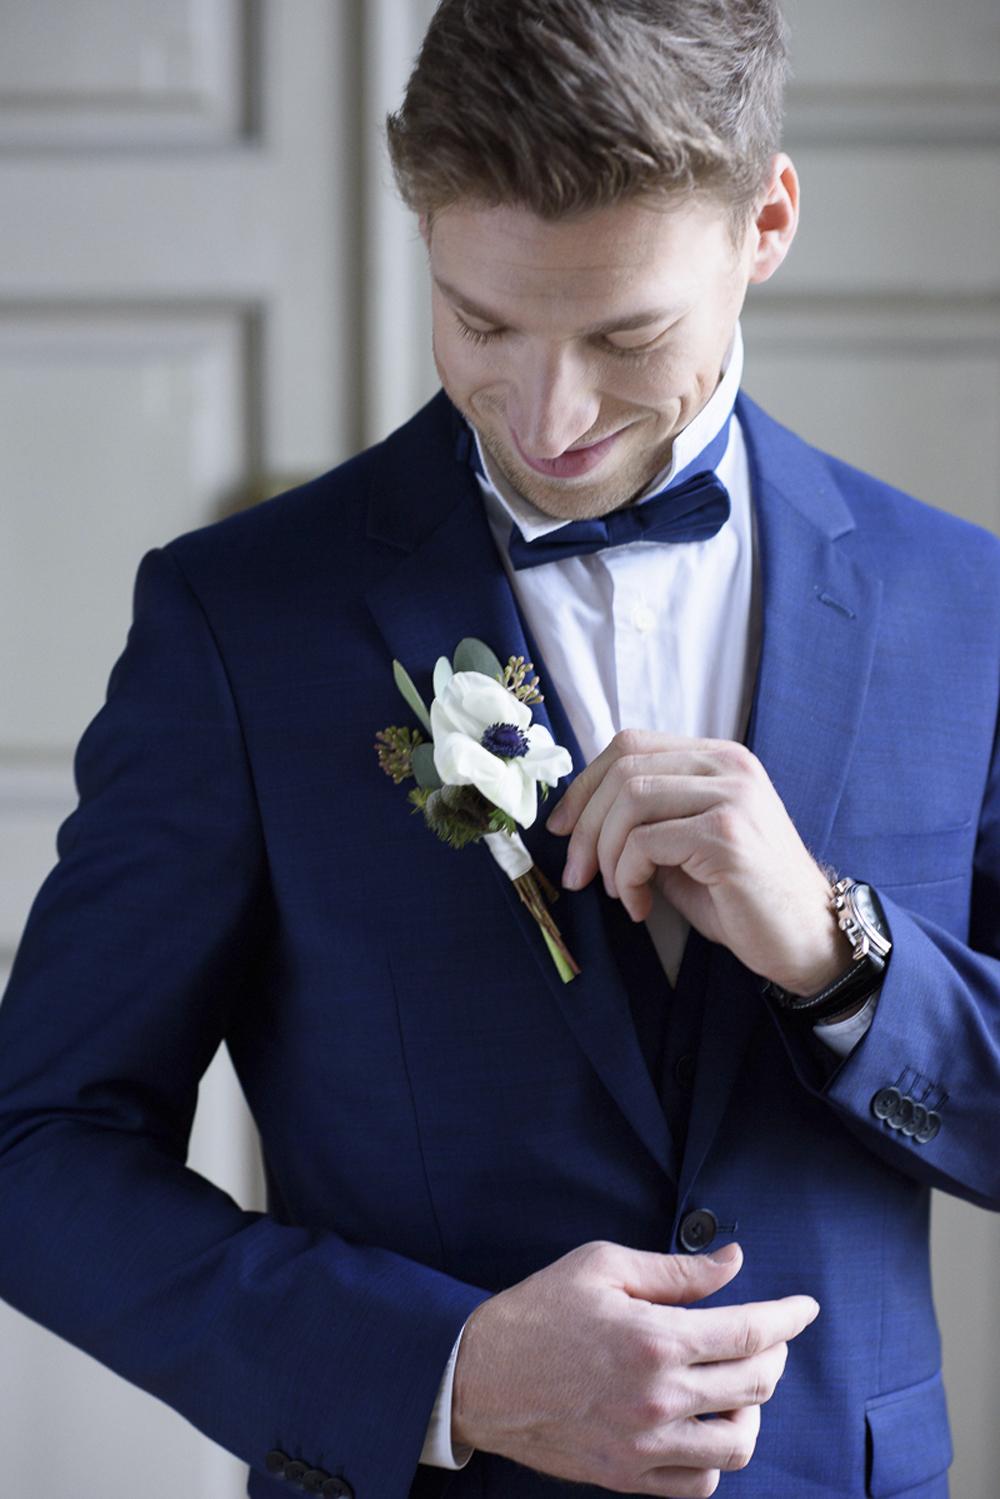 Groom getting ready blue accessories on wedding day by wedding photographer Barbara Wenz Vienna Austria